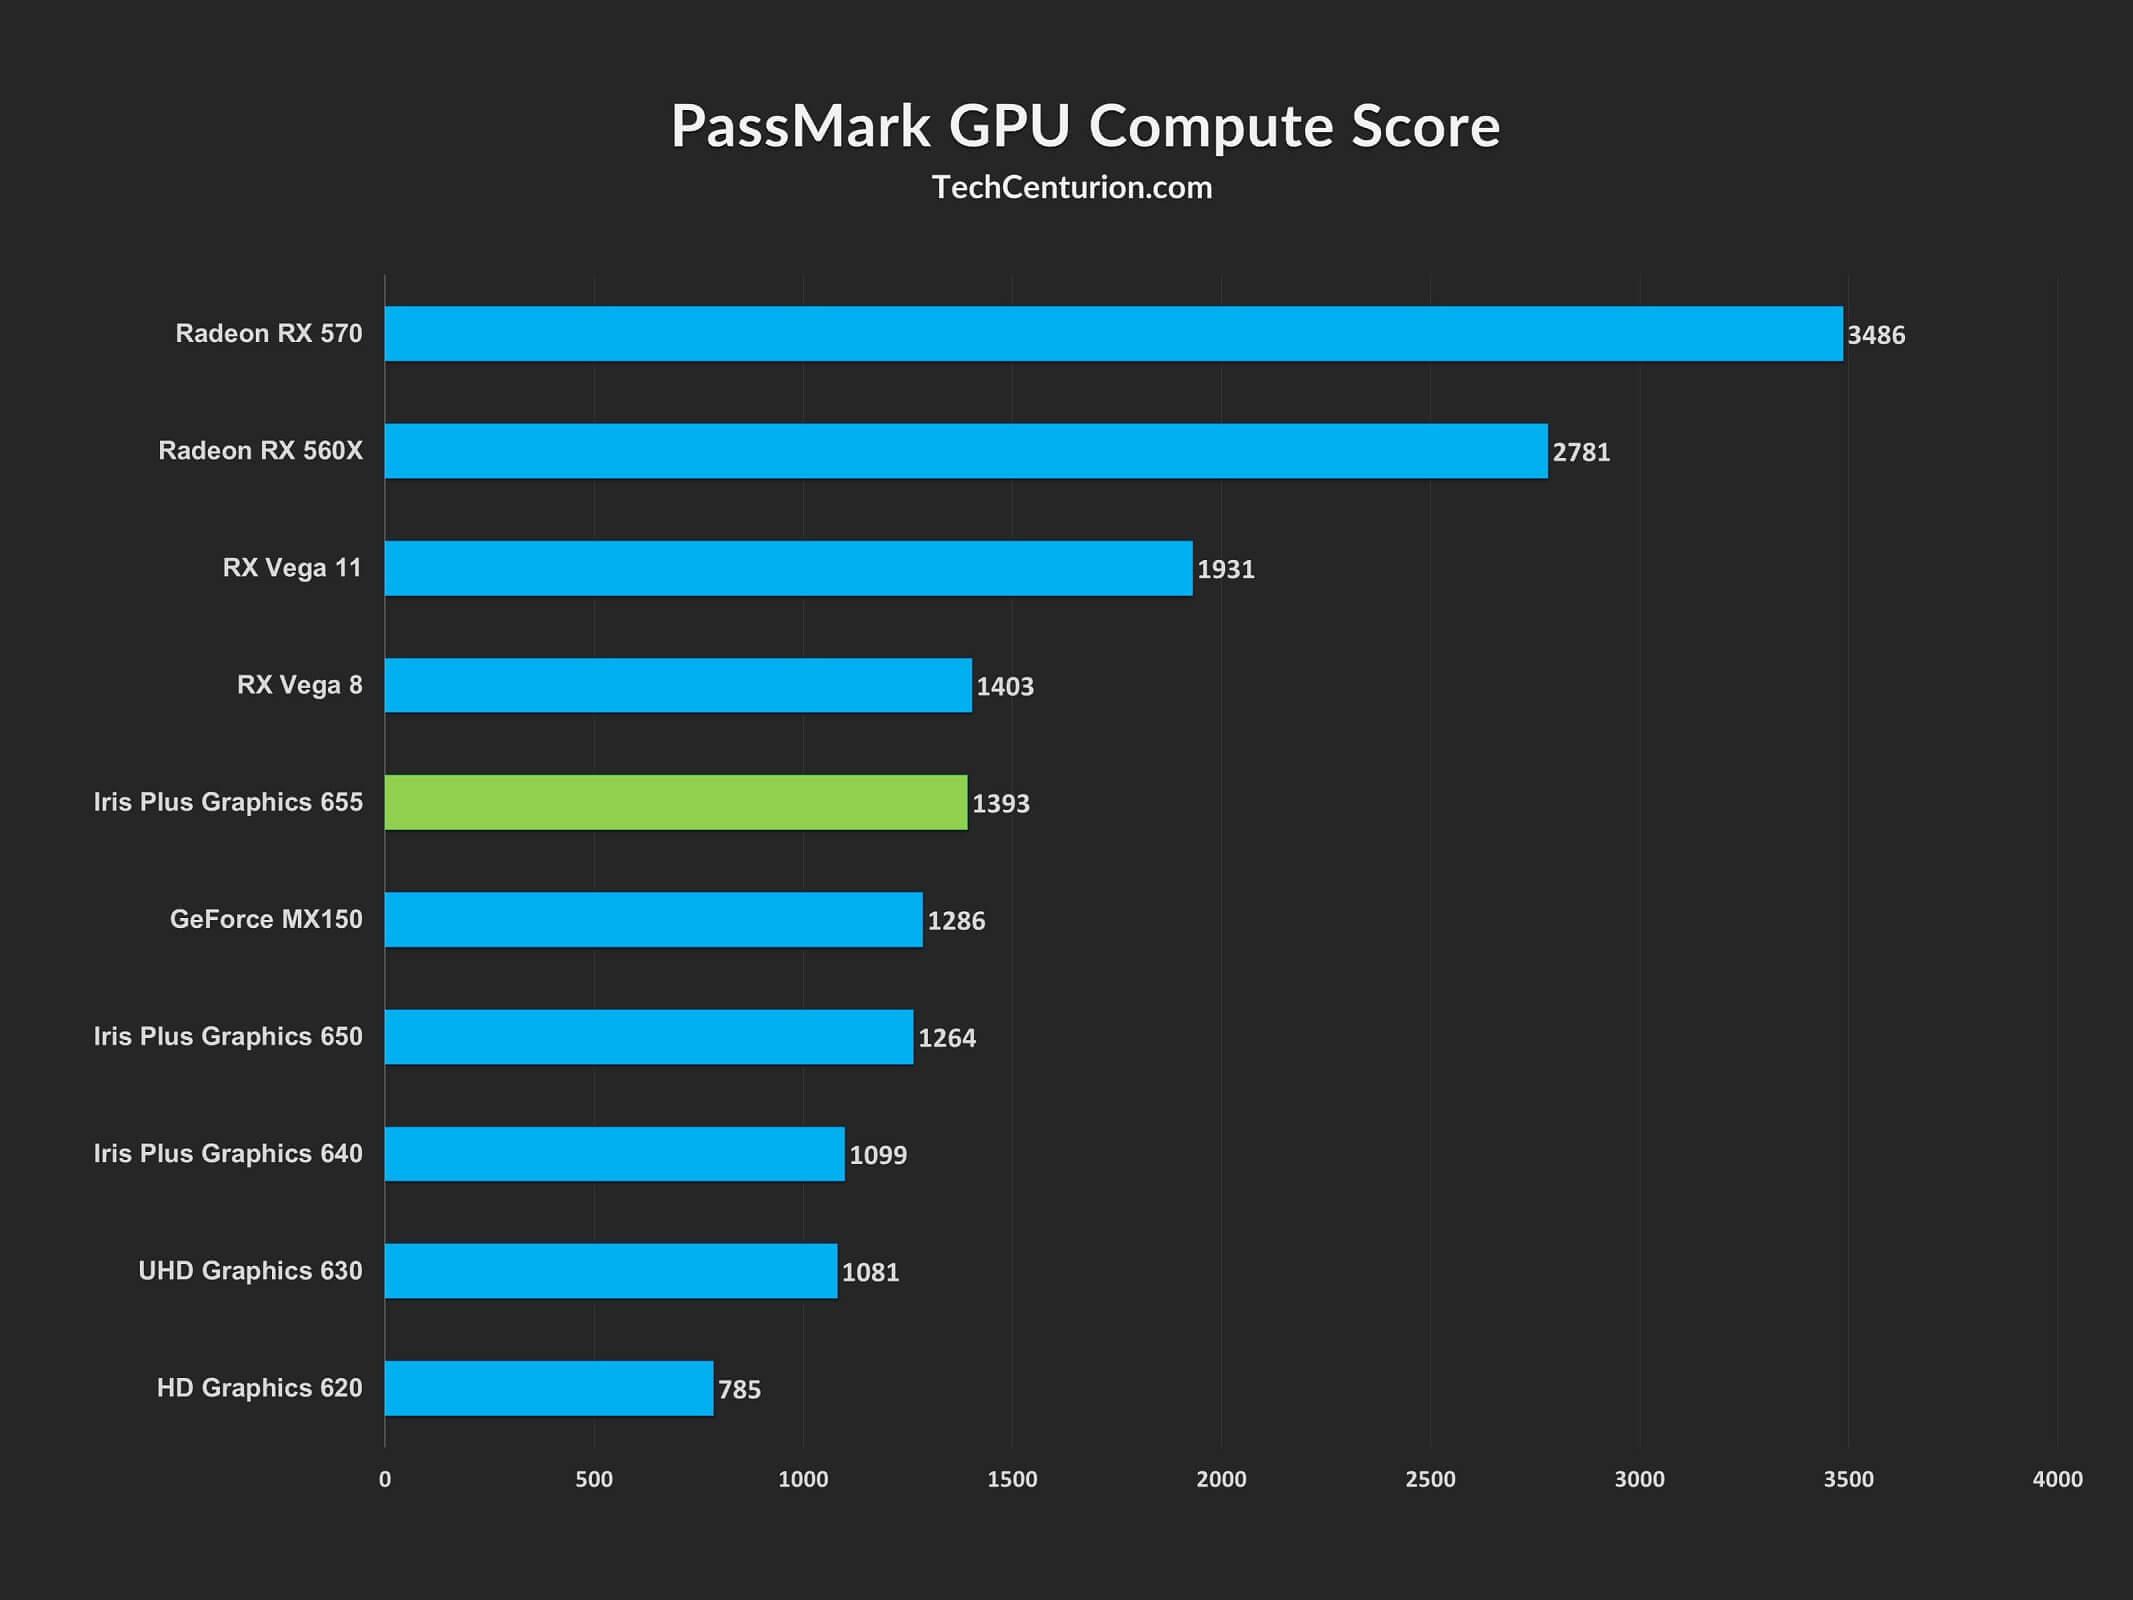 PassMark GPU Compute Score Comparison